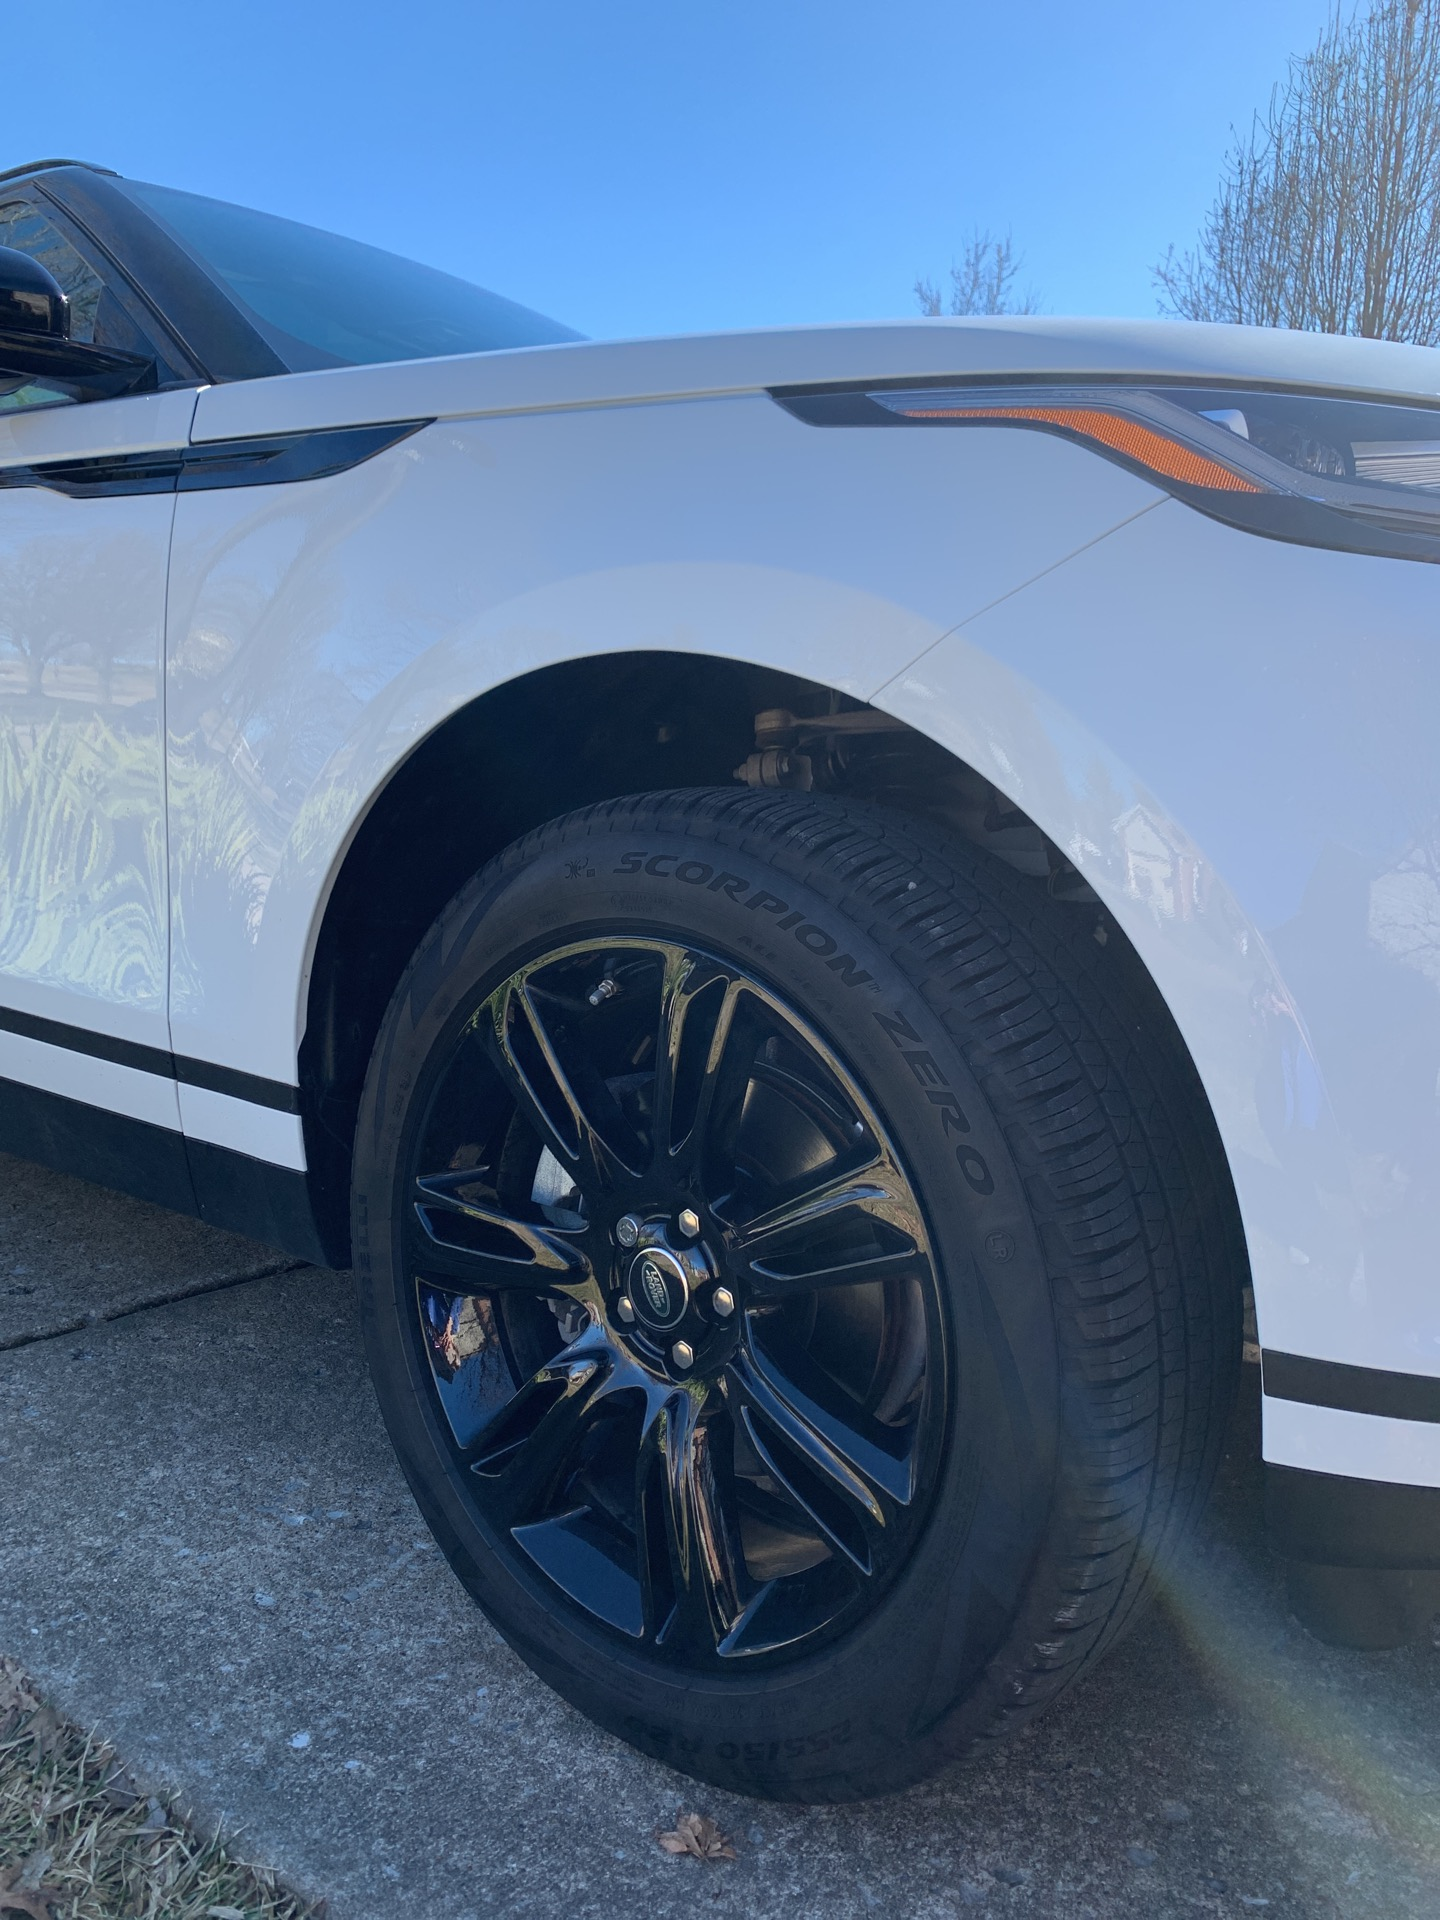 2020 Land Rover Range Rover Velar - photo 2